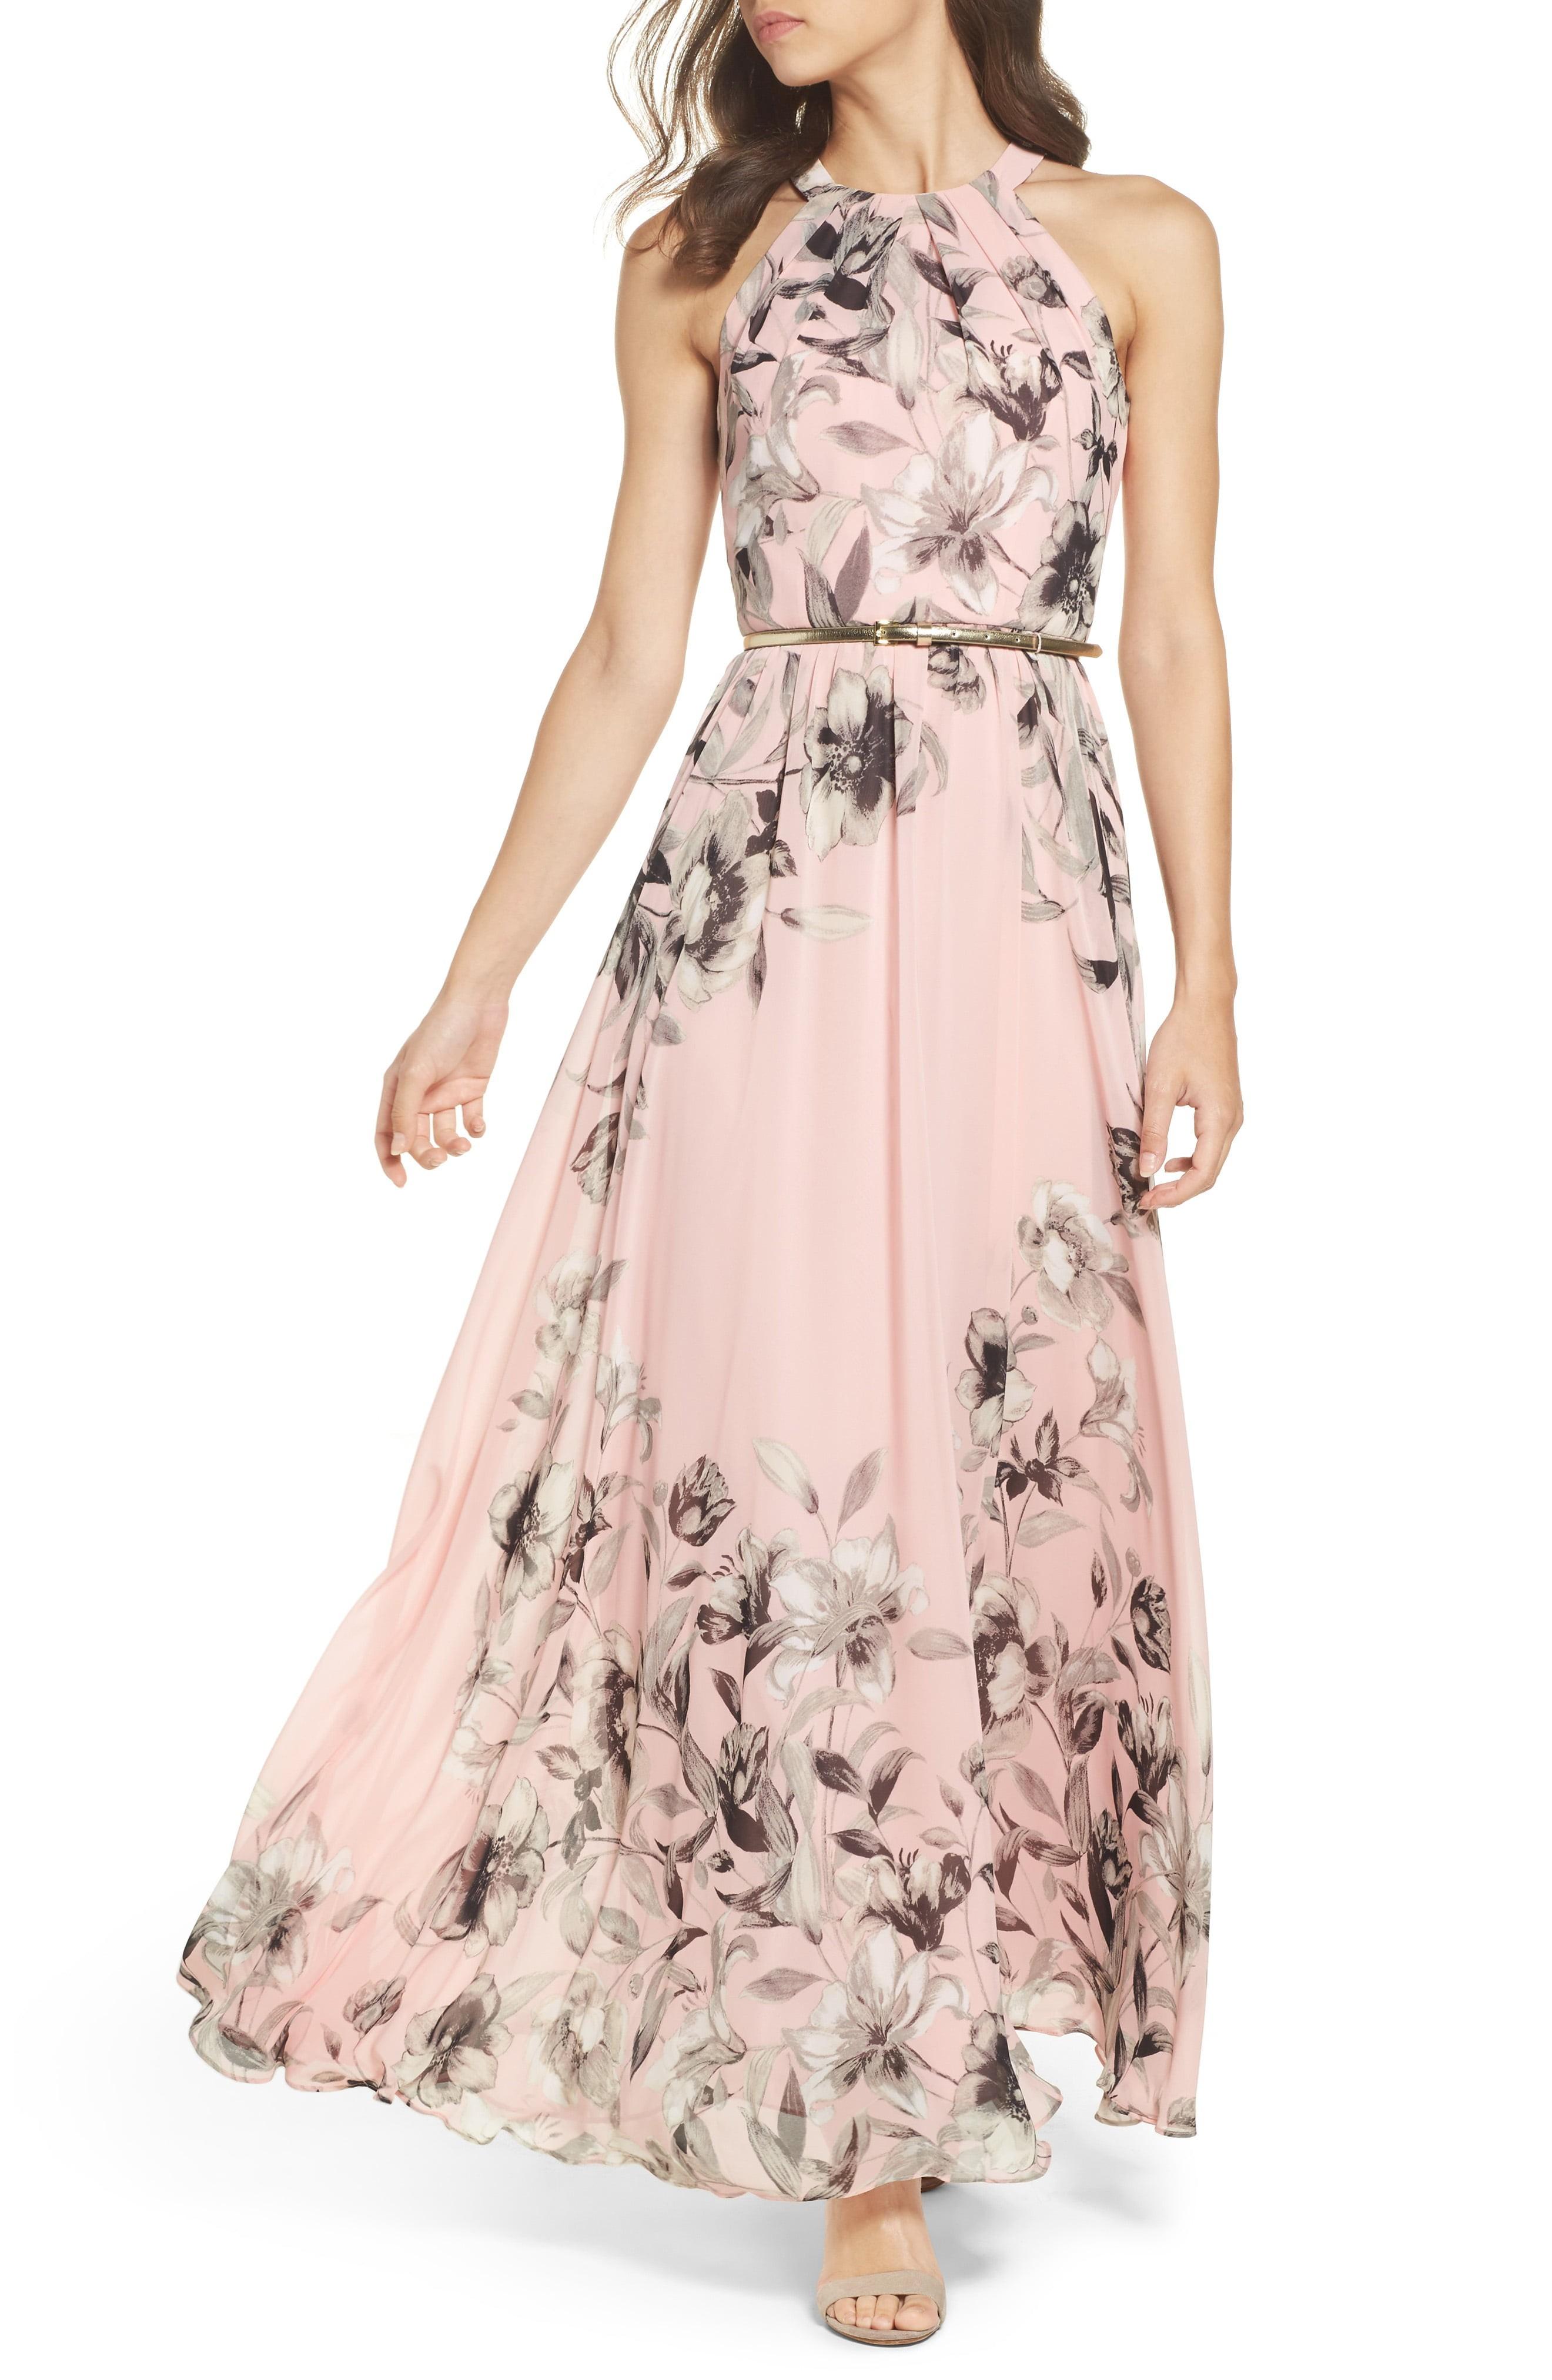 Beach Wedding Guest Dresses | What to Wear to a Beach Wedding